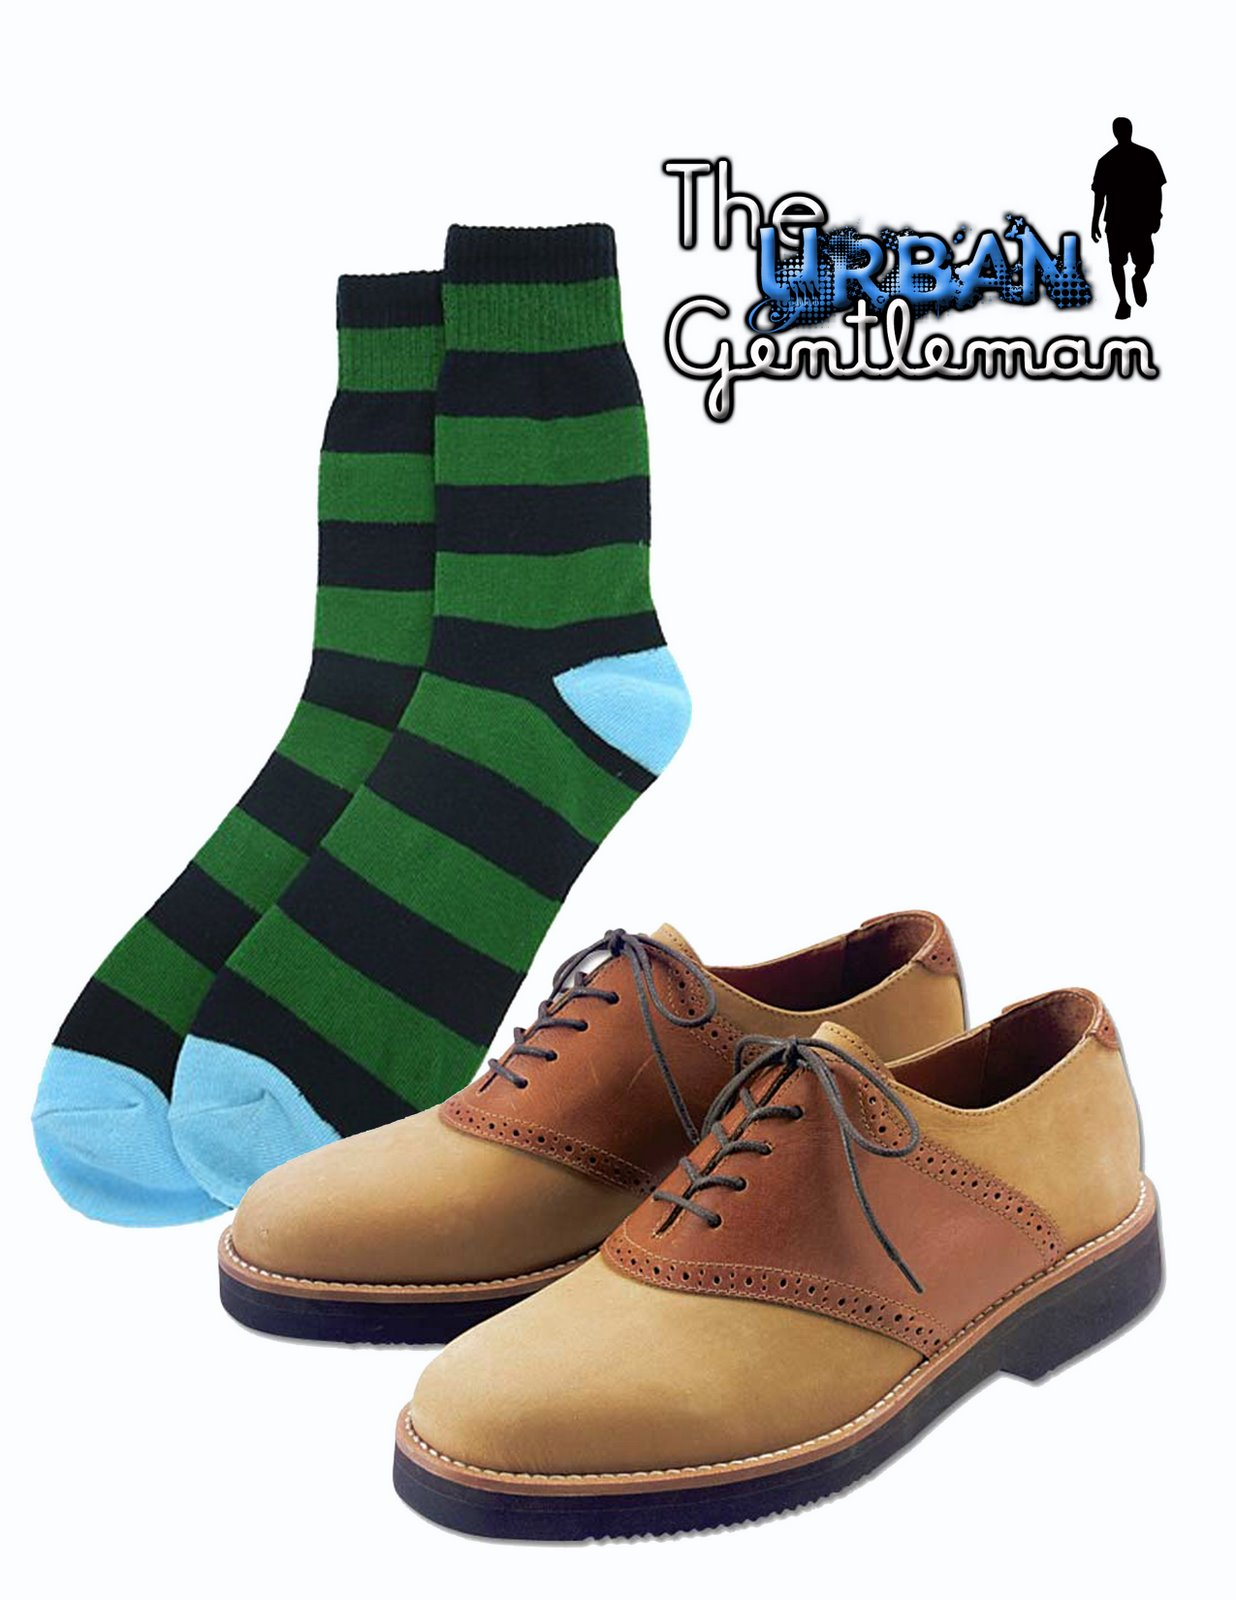 [socksandshoes1]